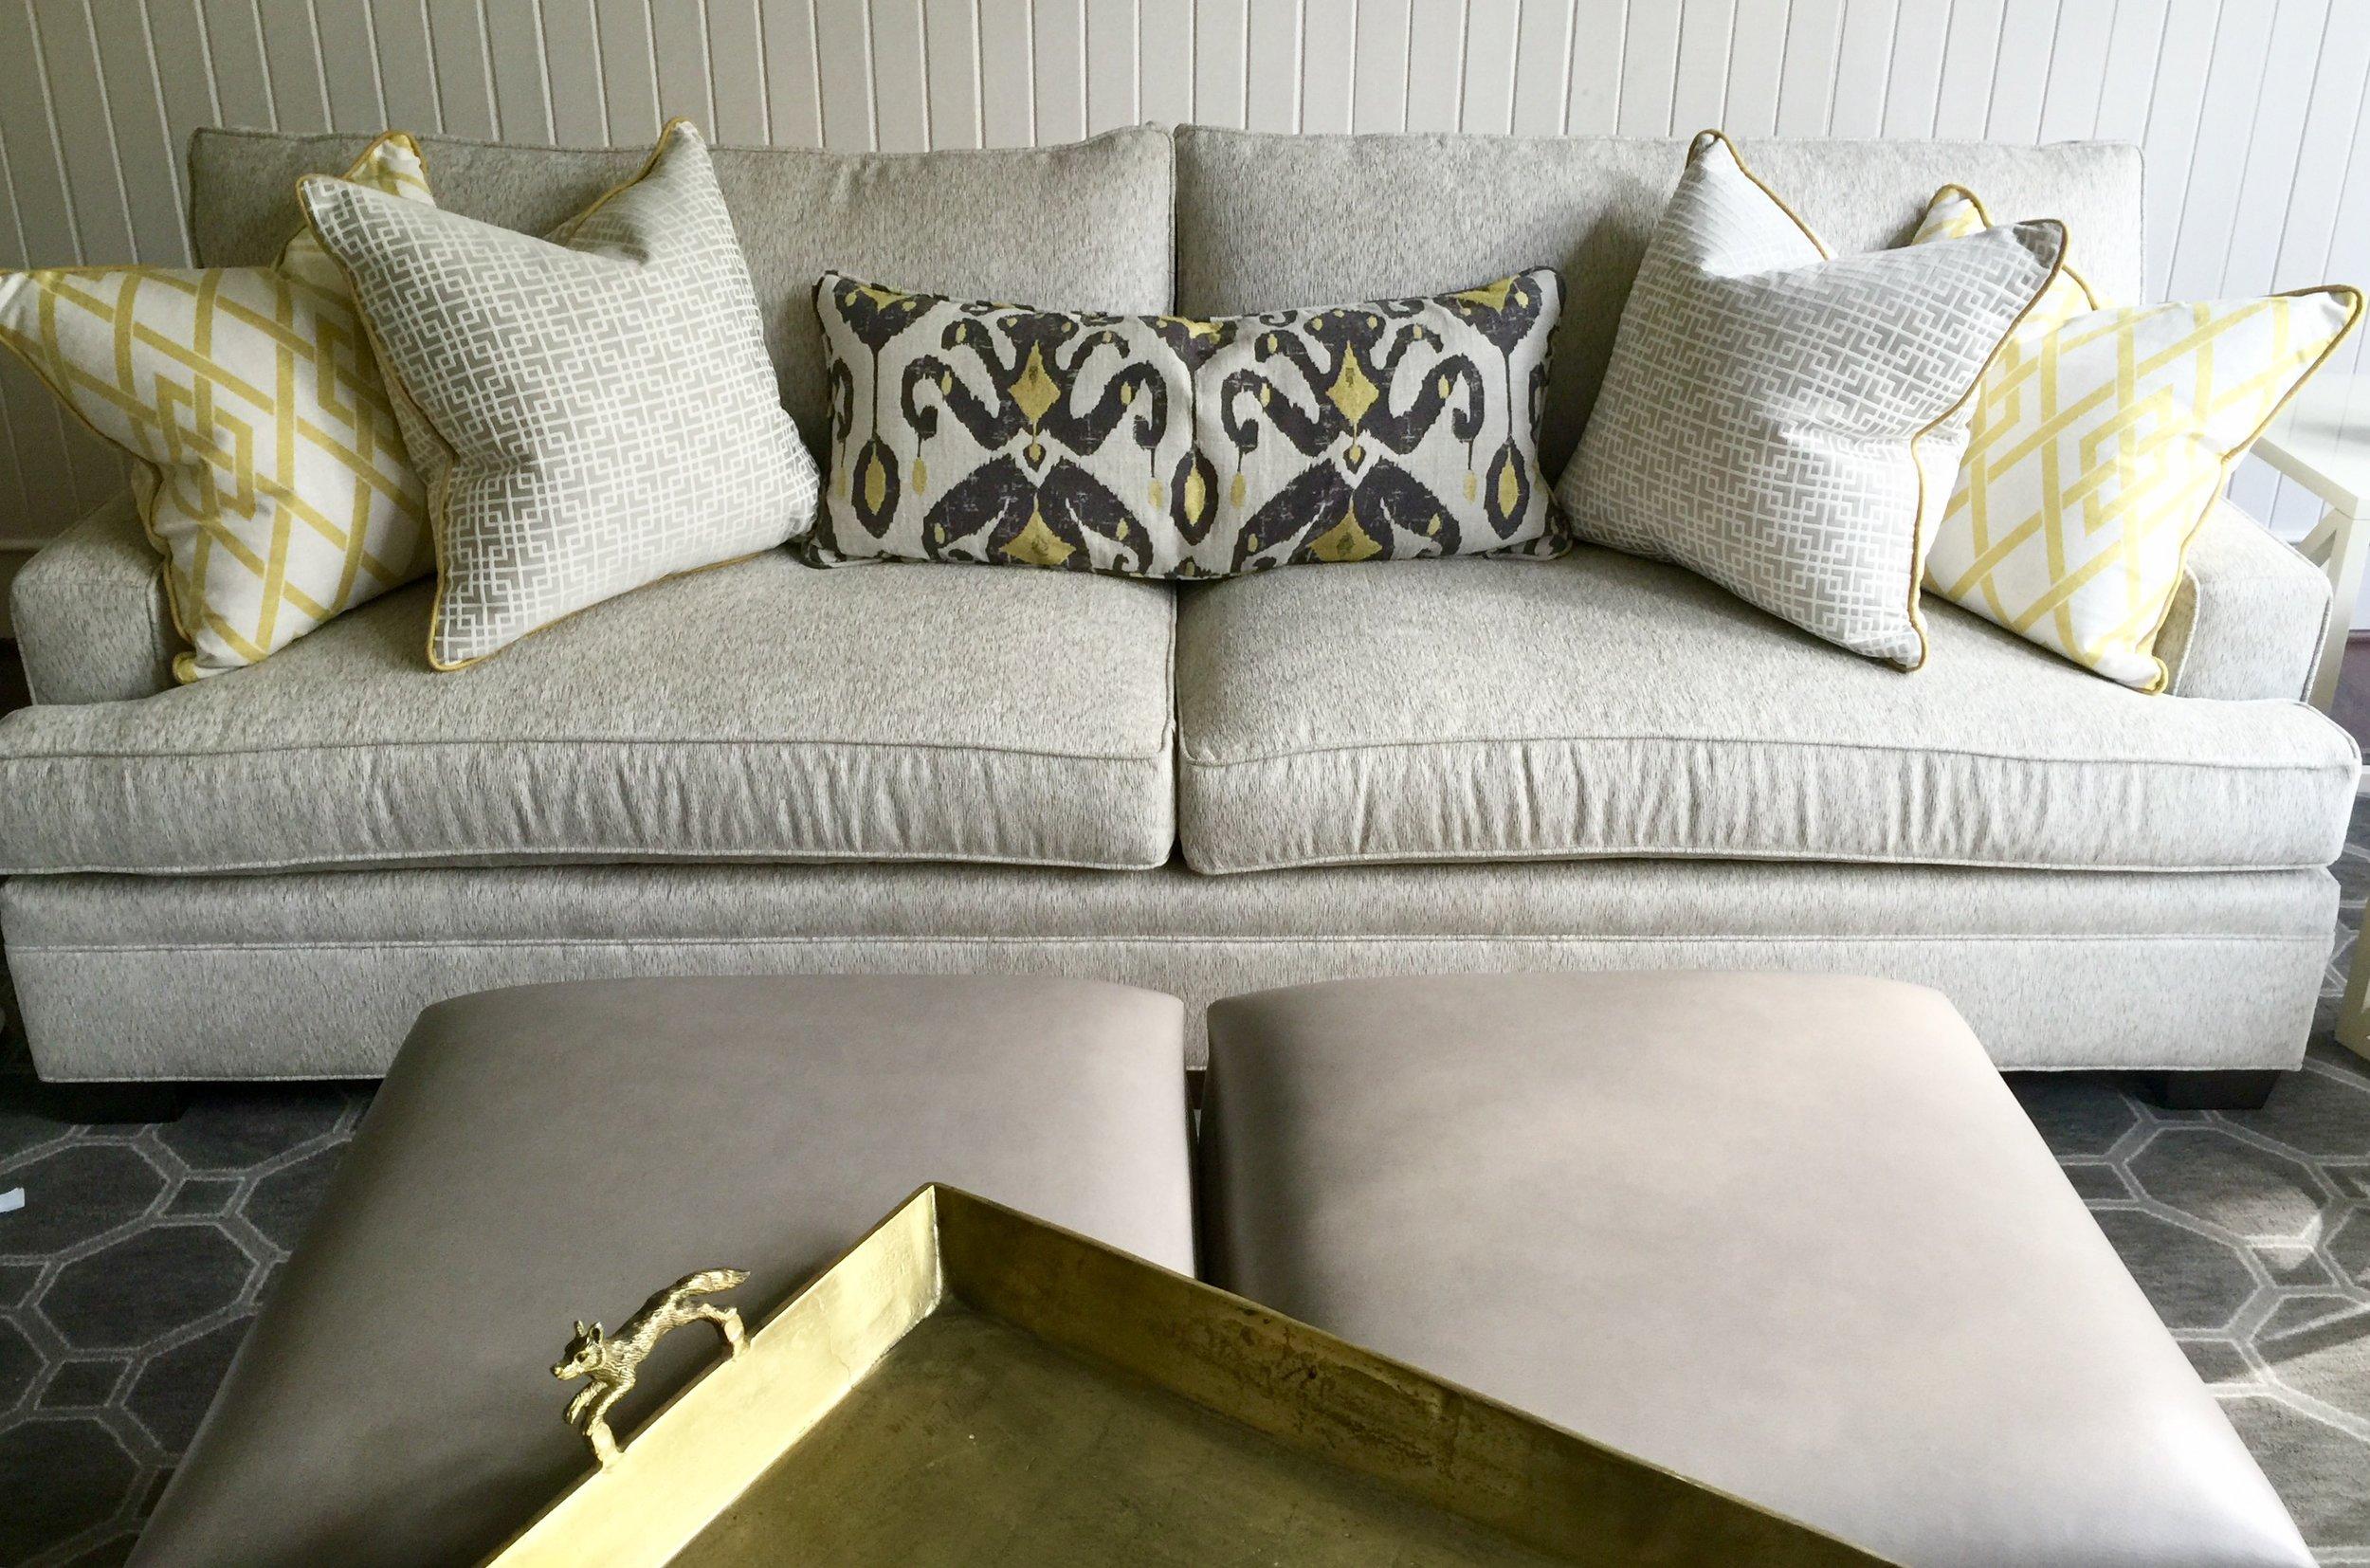 decorative throw pillows for